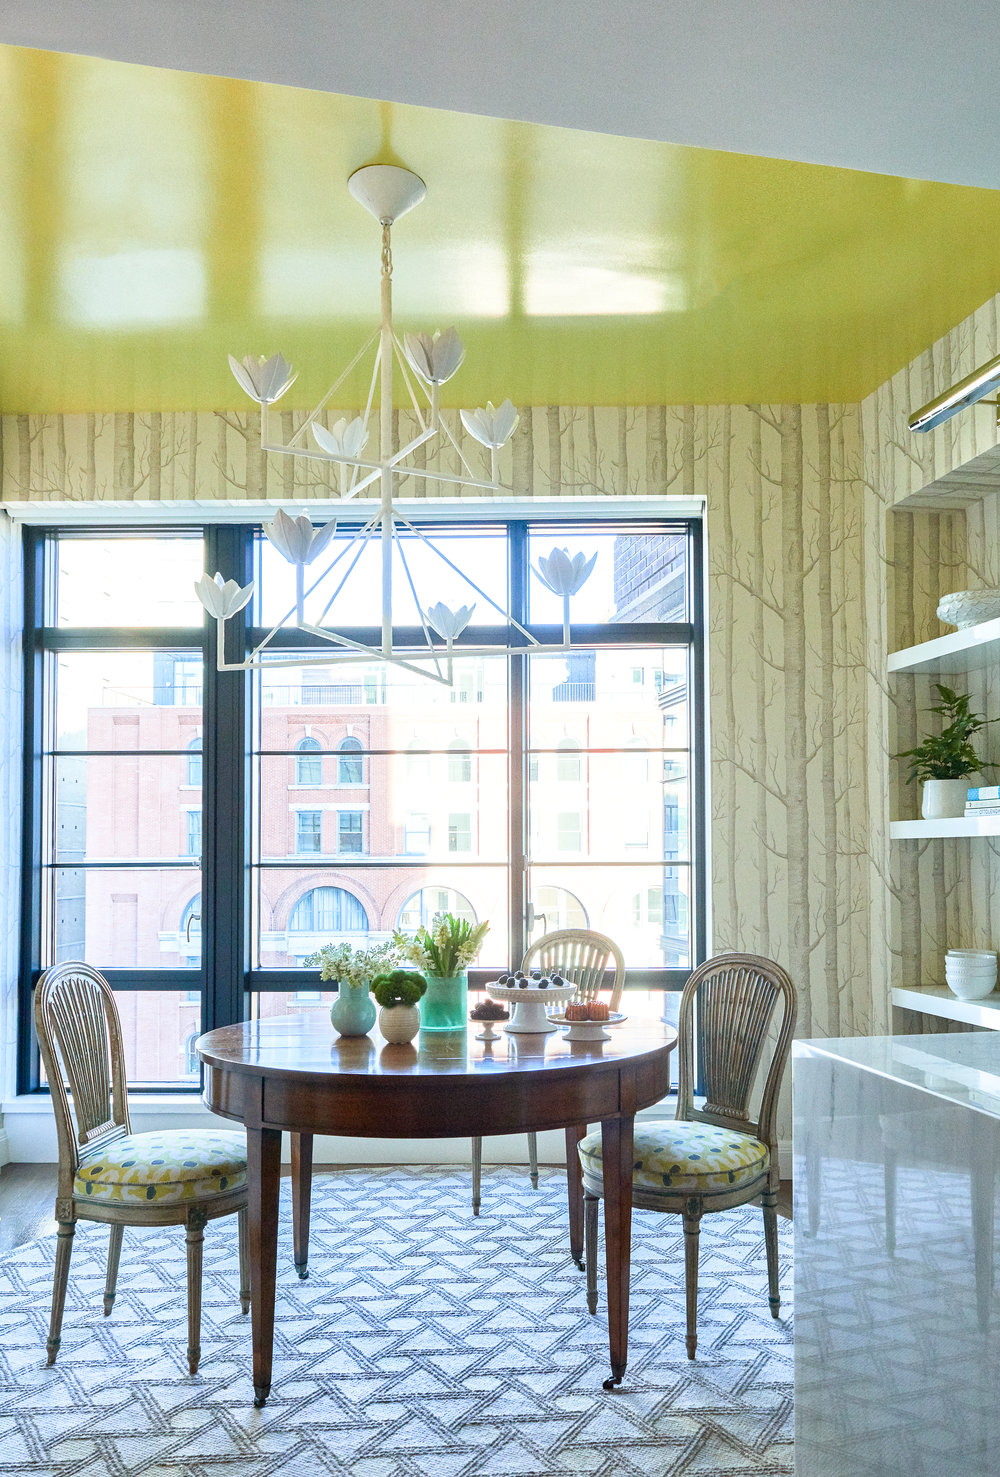 dining-room-nyc-lyon-field-interior-design-©Jane Beiles-0717.jpg